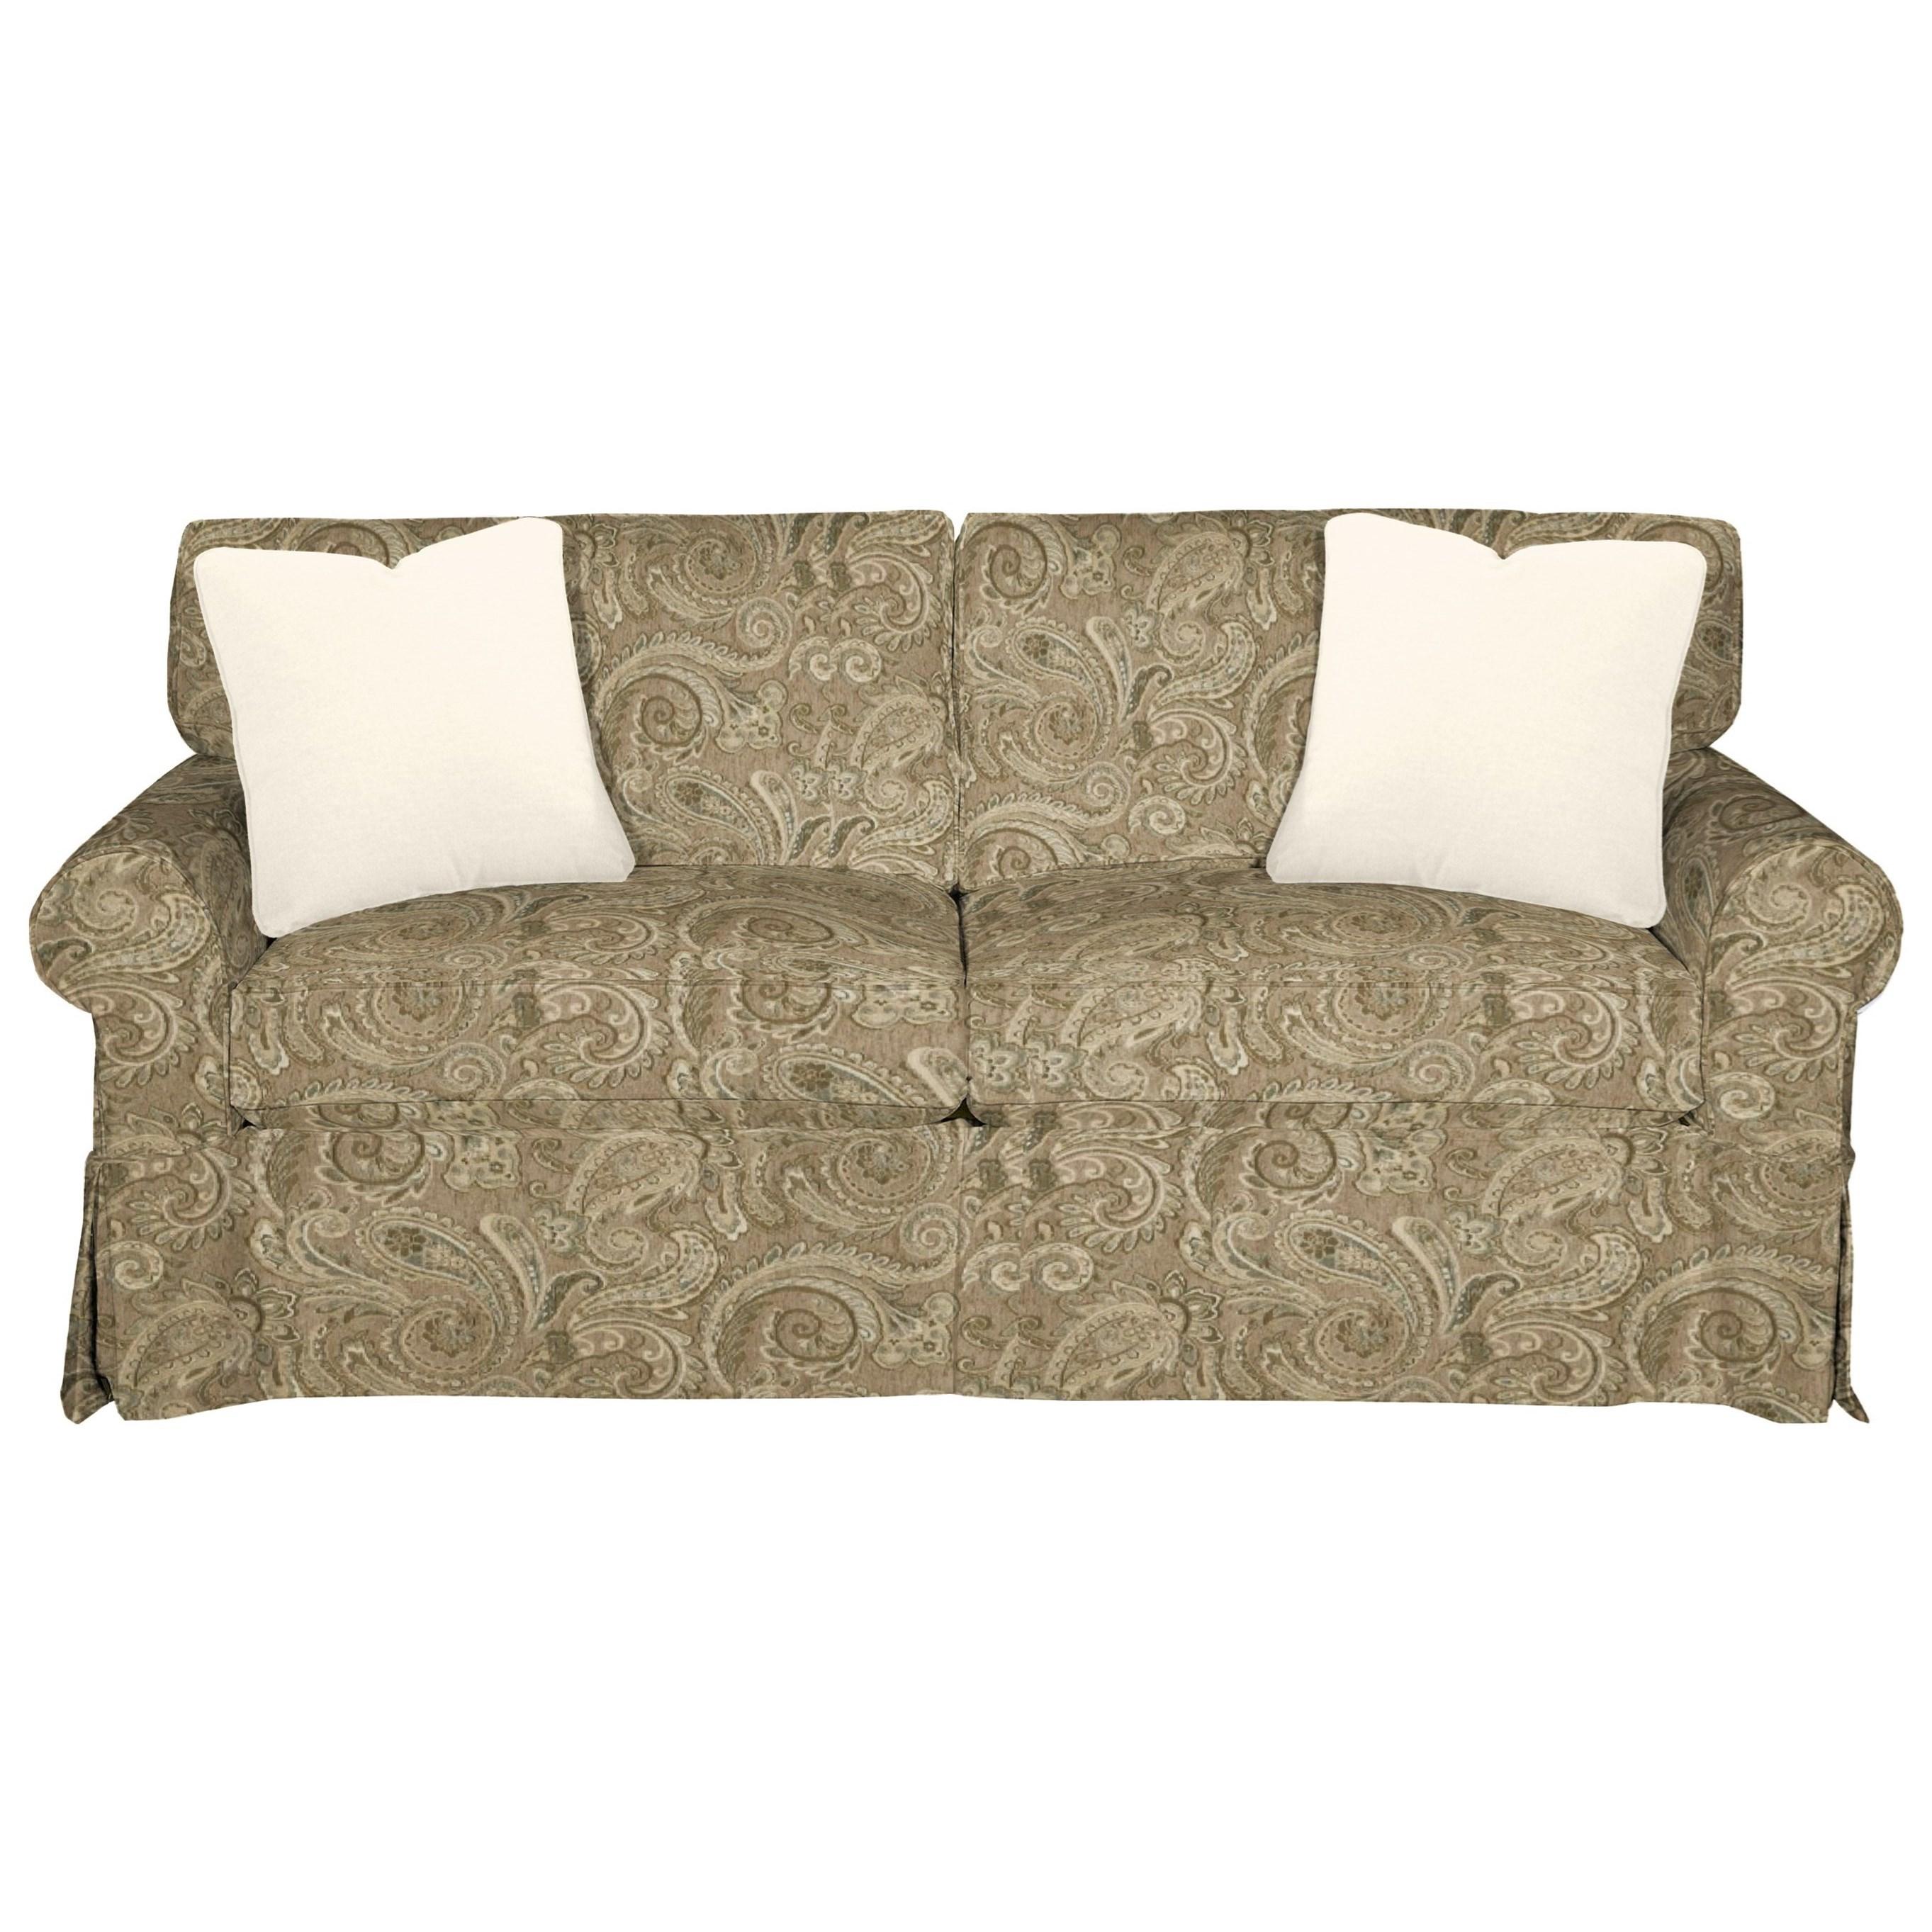 9228 Sleeper Sofa w/ Innerspring Mattress by Craftmaster at Stuckey Furniture